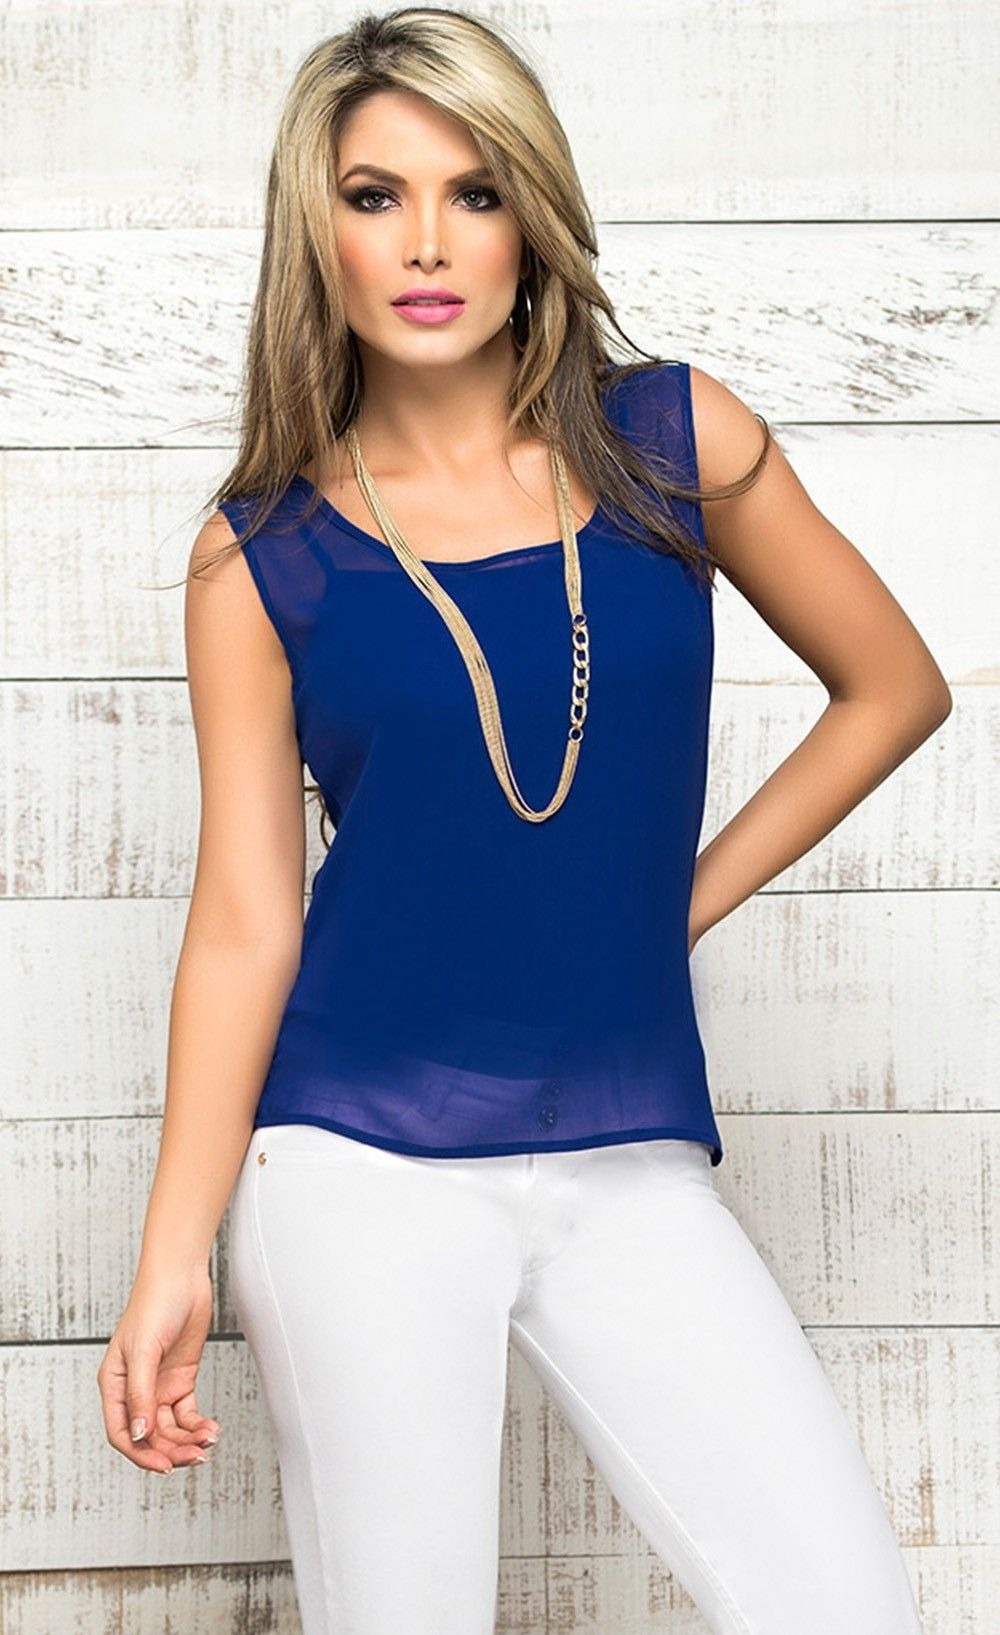 Outfit Pantalon Blanco Blusa Azul - Buscar Con Google | Blue Fashion | Pinterest | Blusa Azul ...